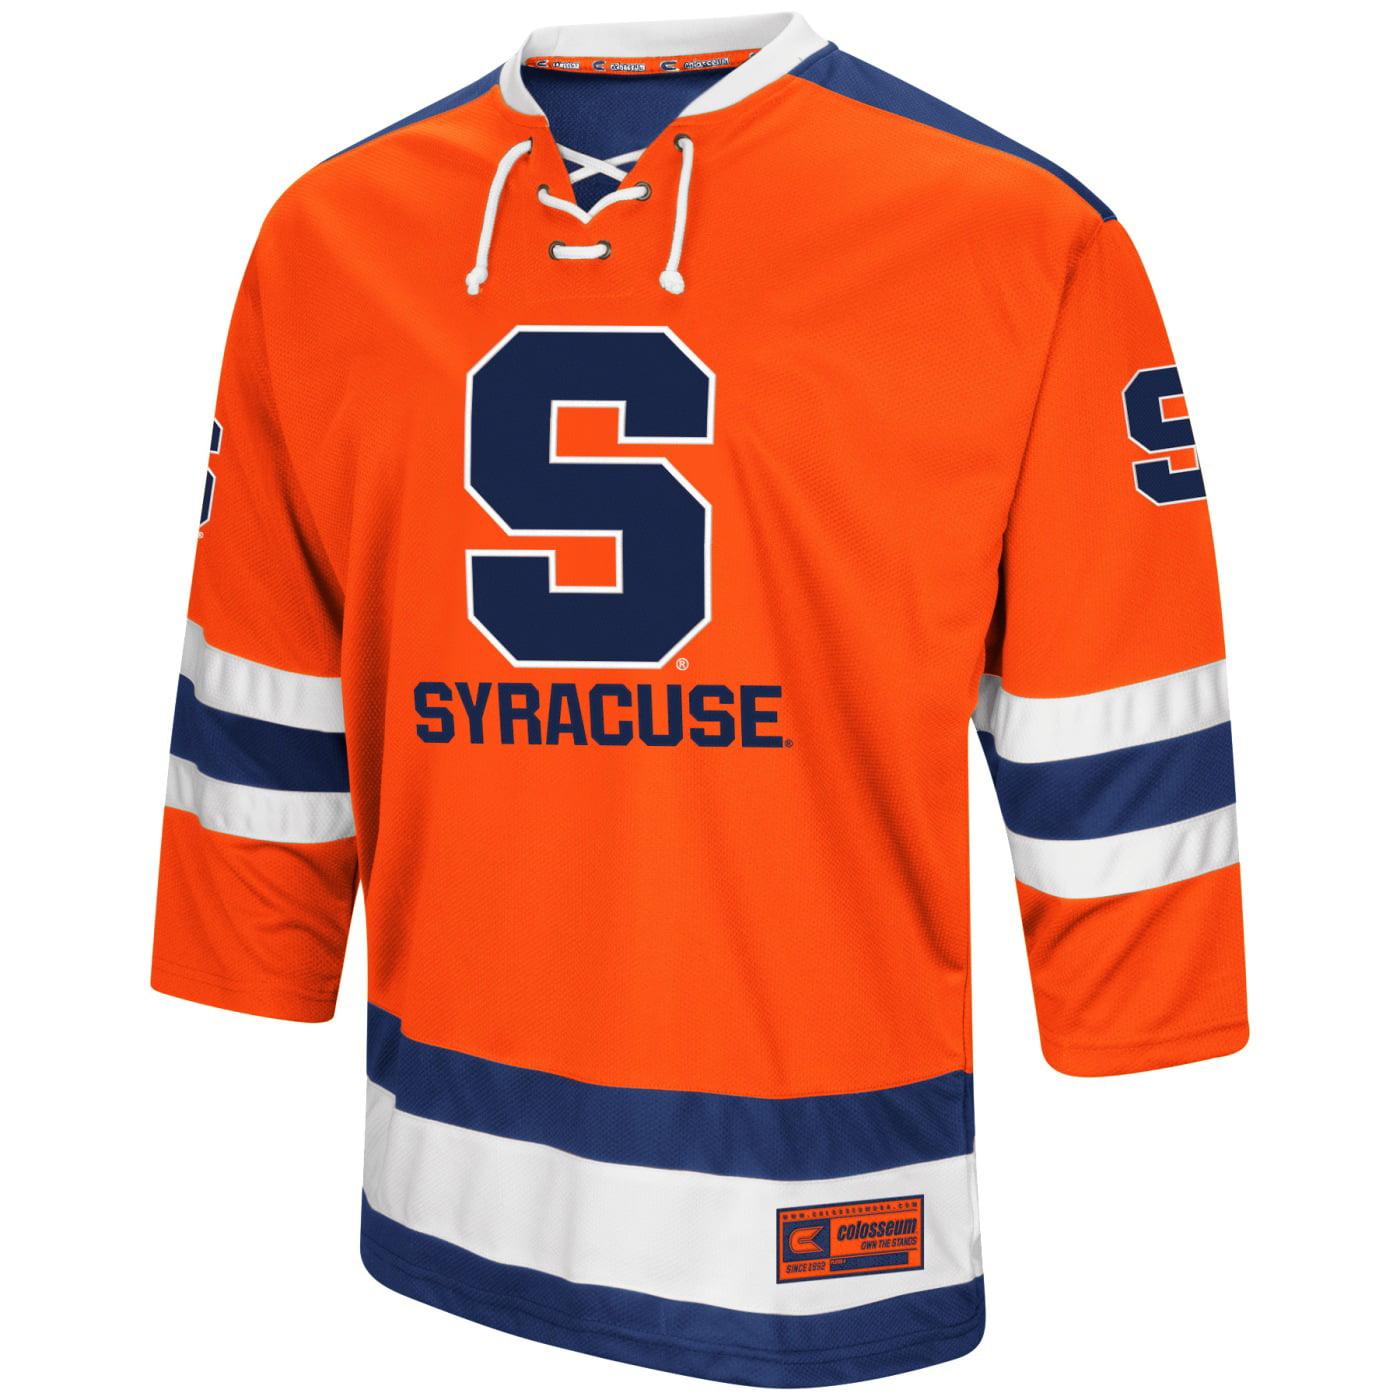 "Syracuse Orange NCAA ""Ice Machine"" Men's Hockey Sweater Jersey"